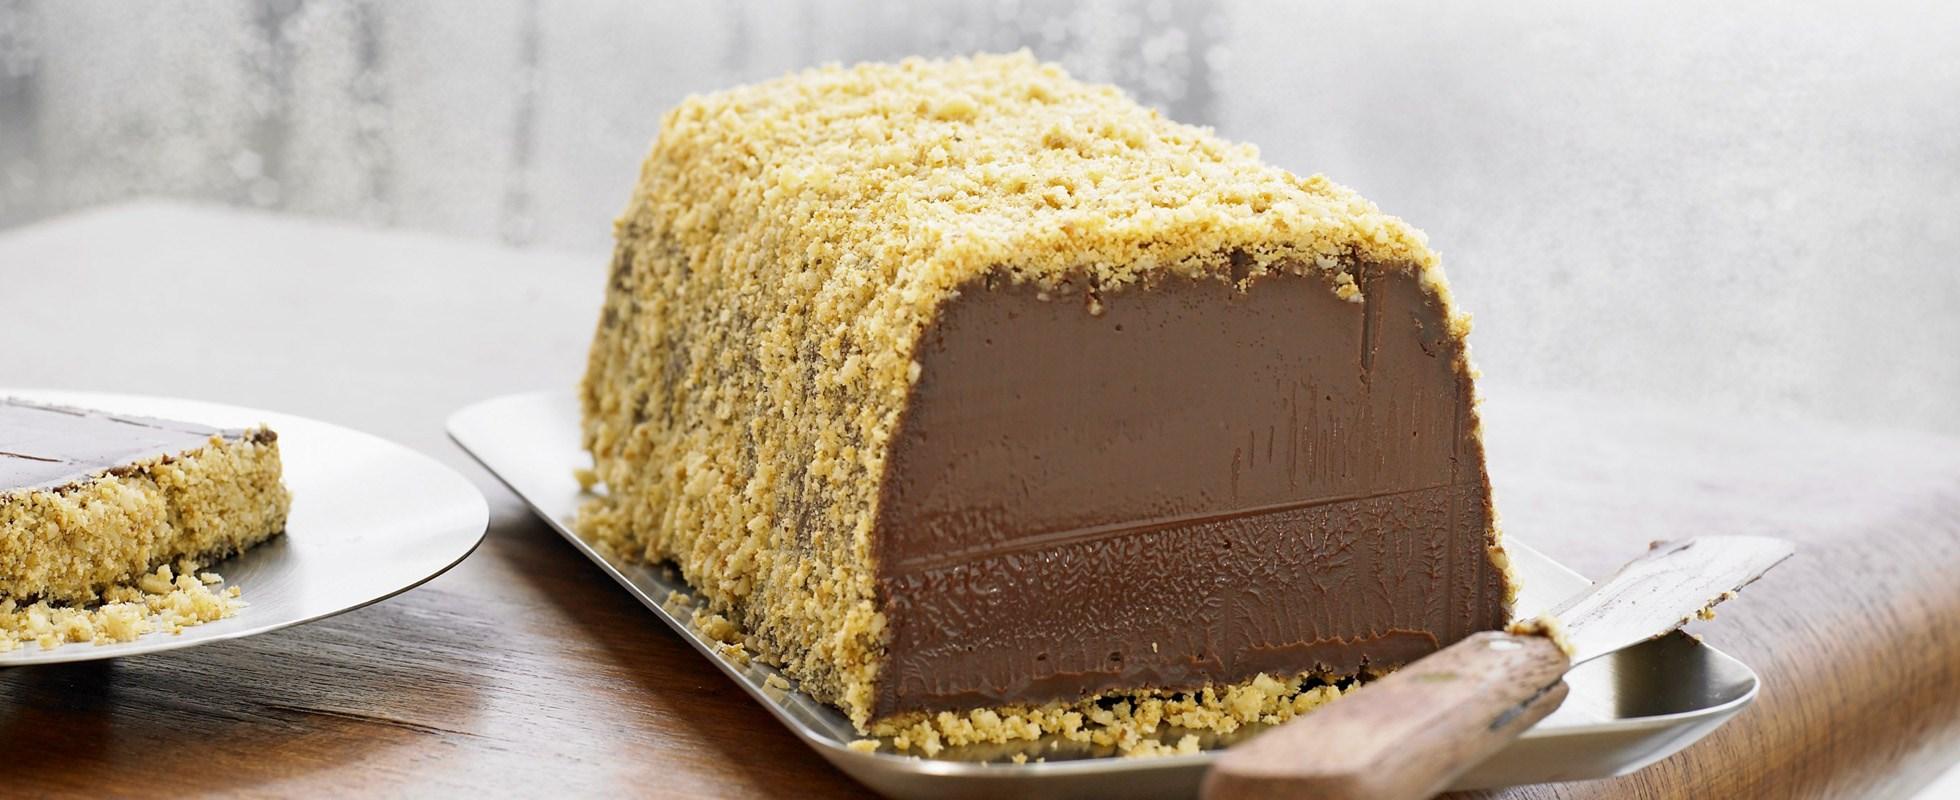 Italian hazelnut and Chocolate Torte Recipe